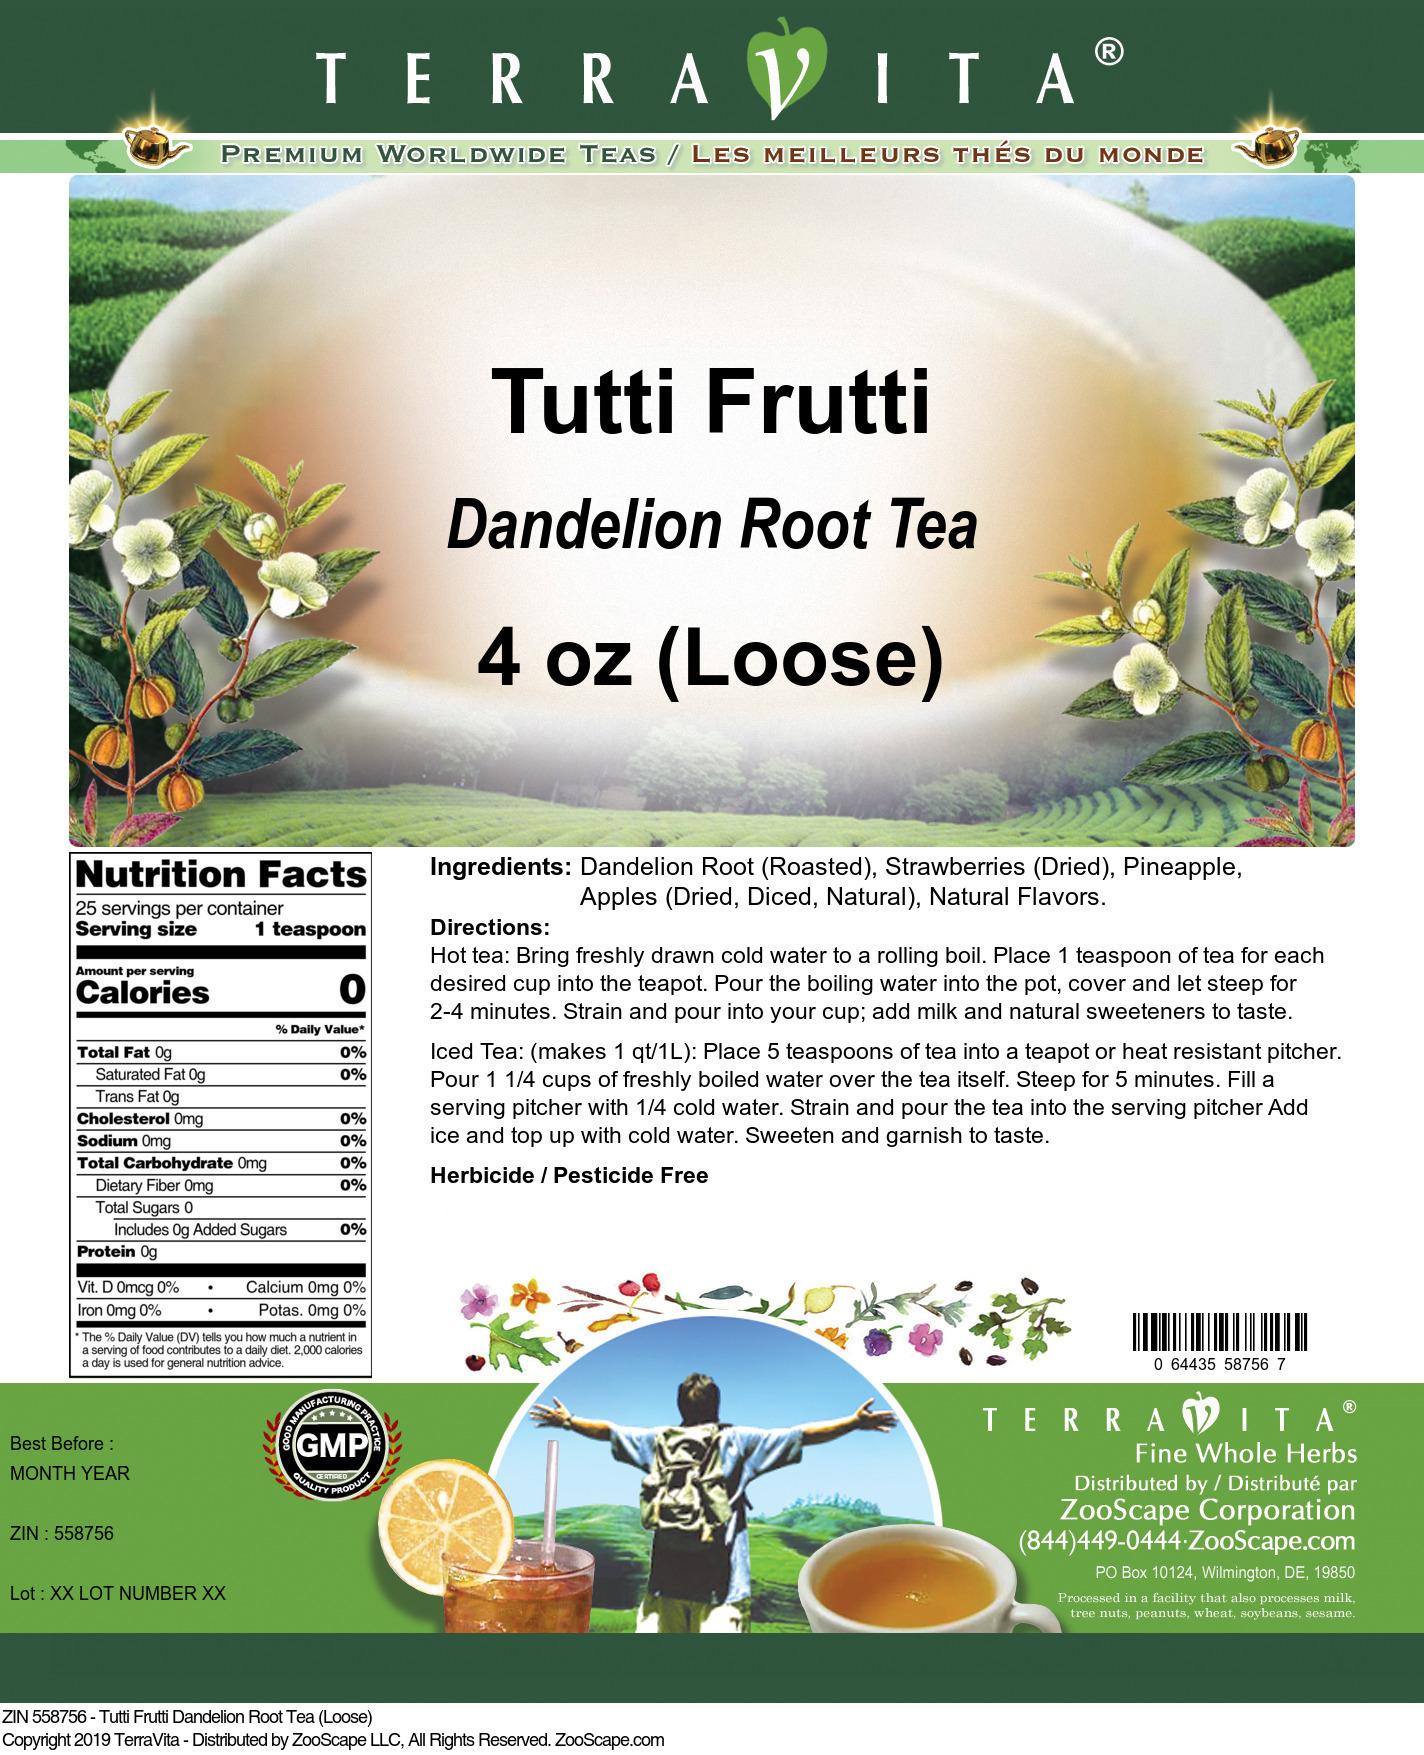 Tutti Frutti Dandelion Root Tea (Loose)